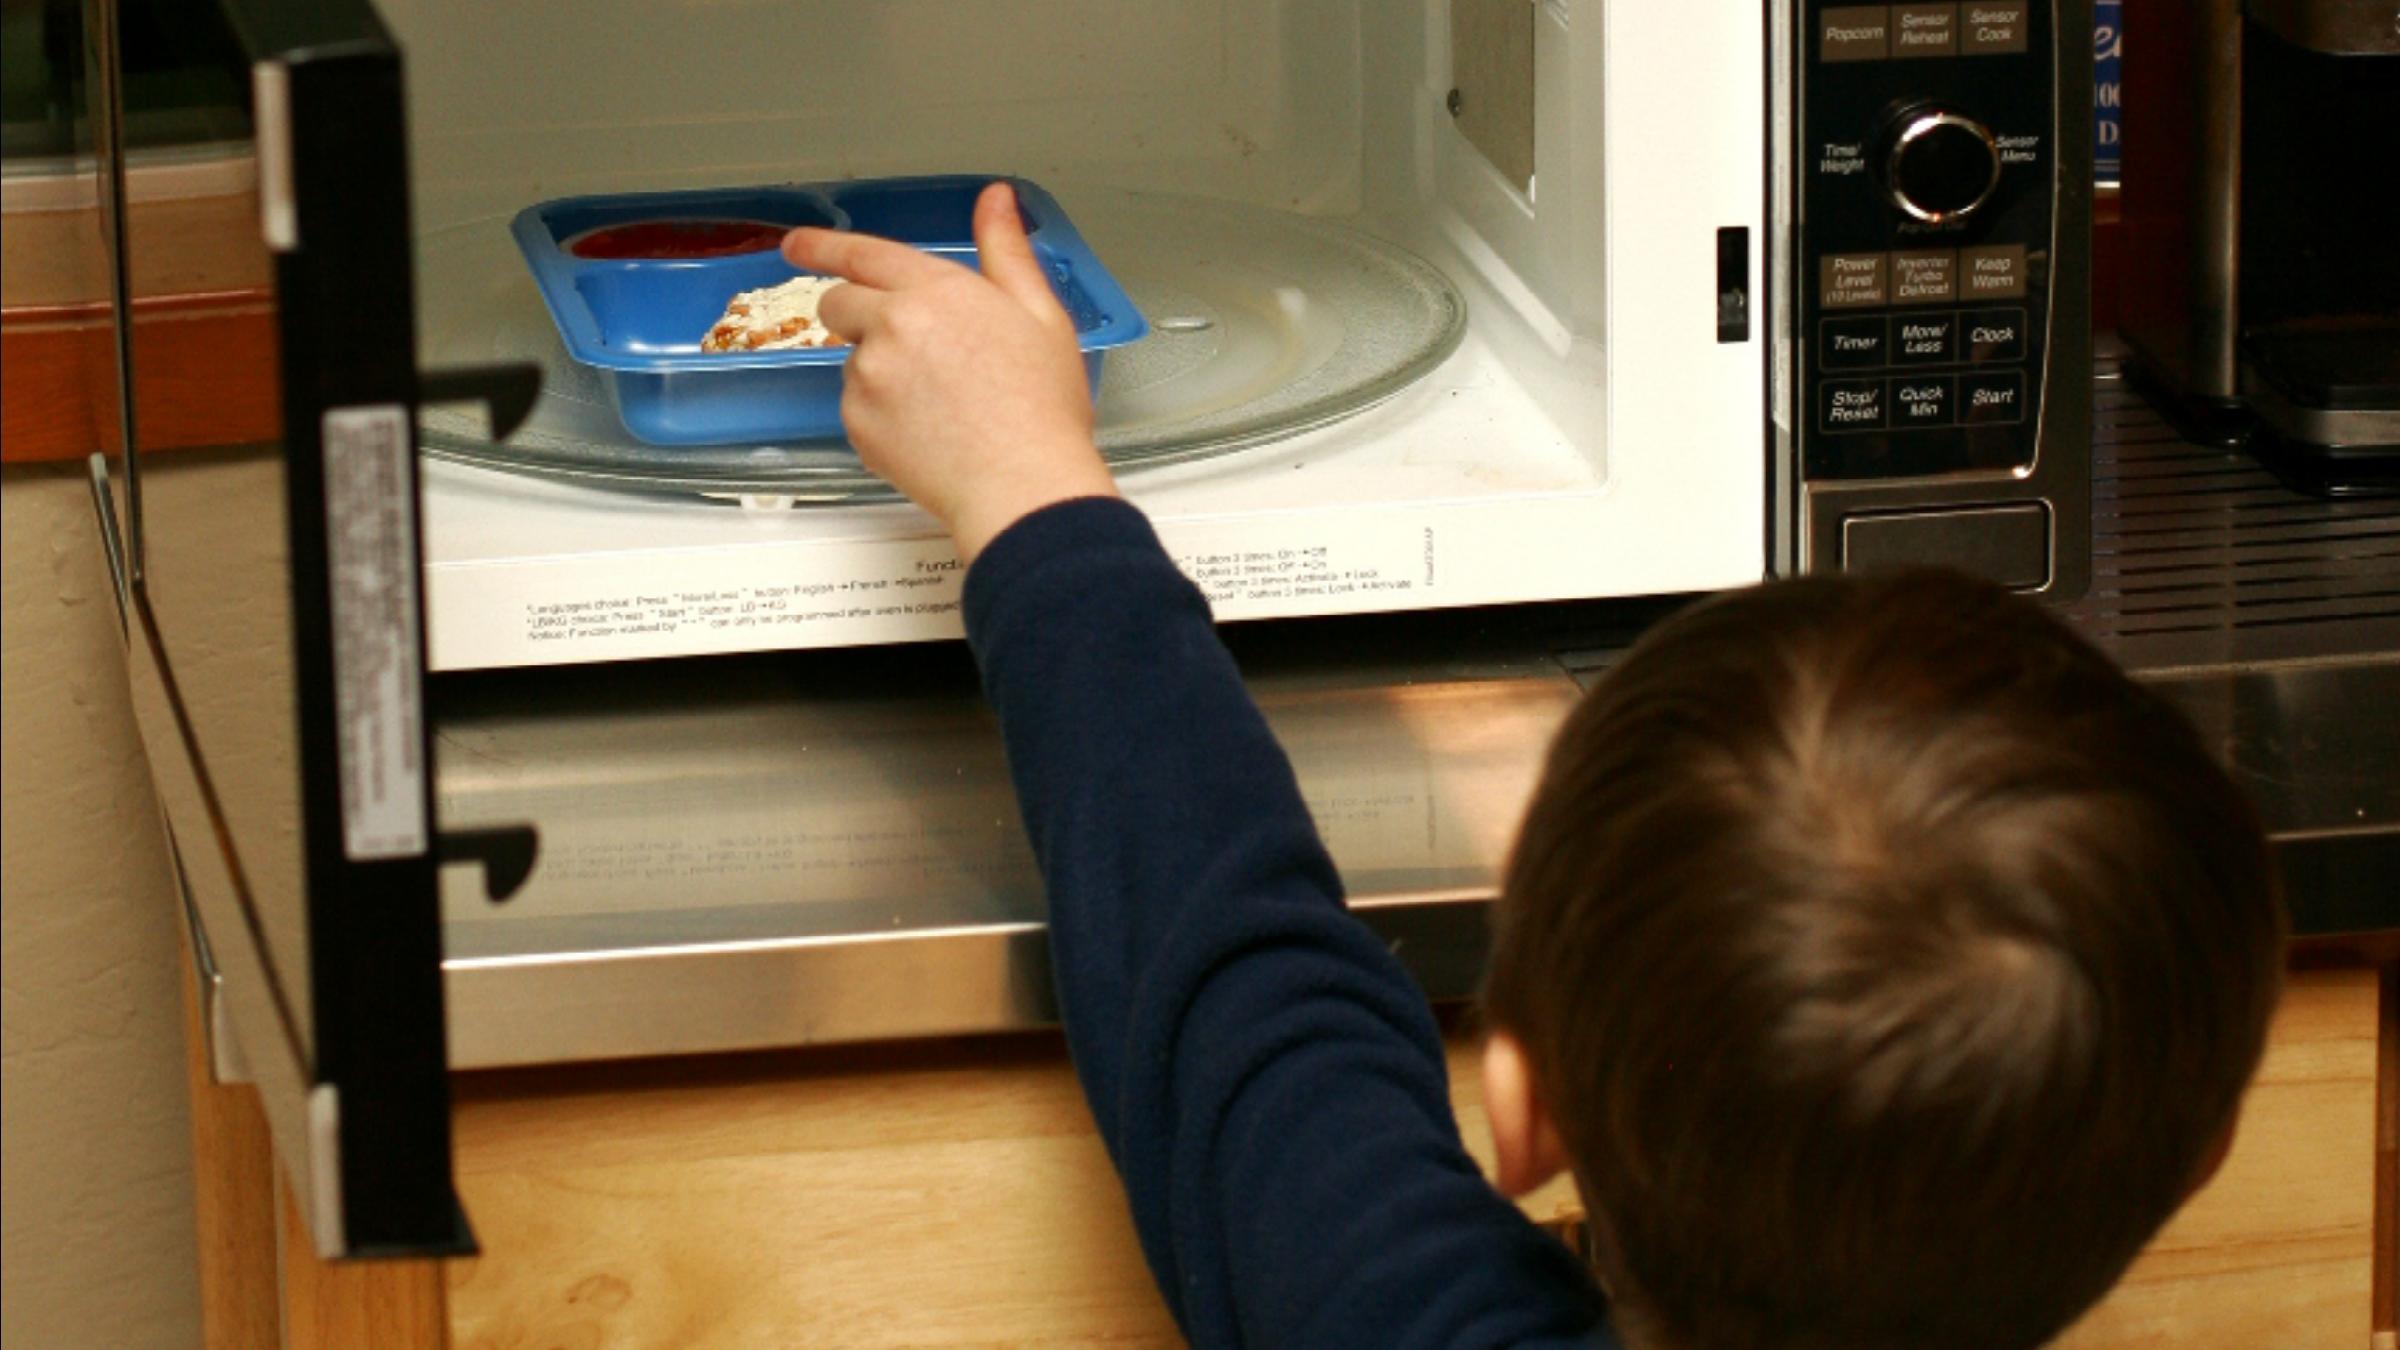 Microwaveable meals